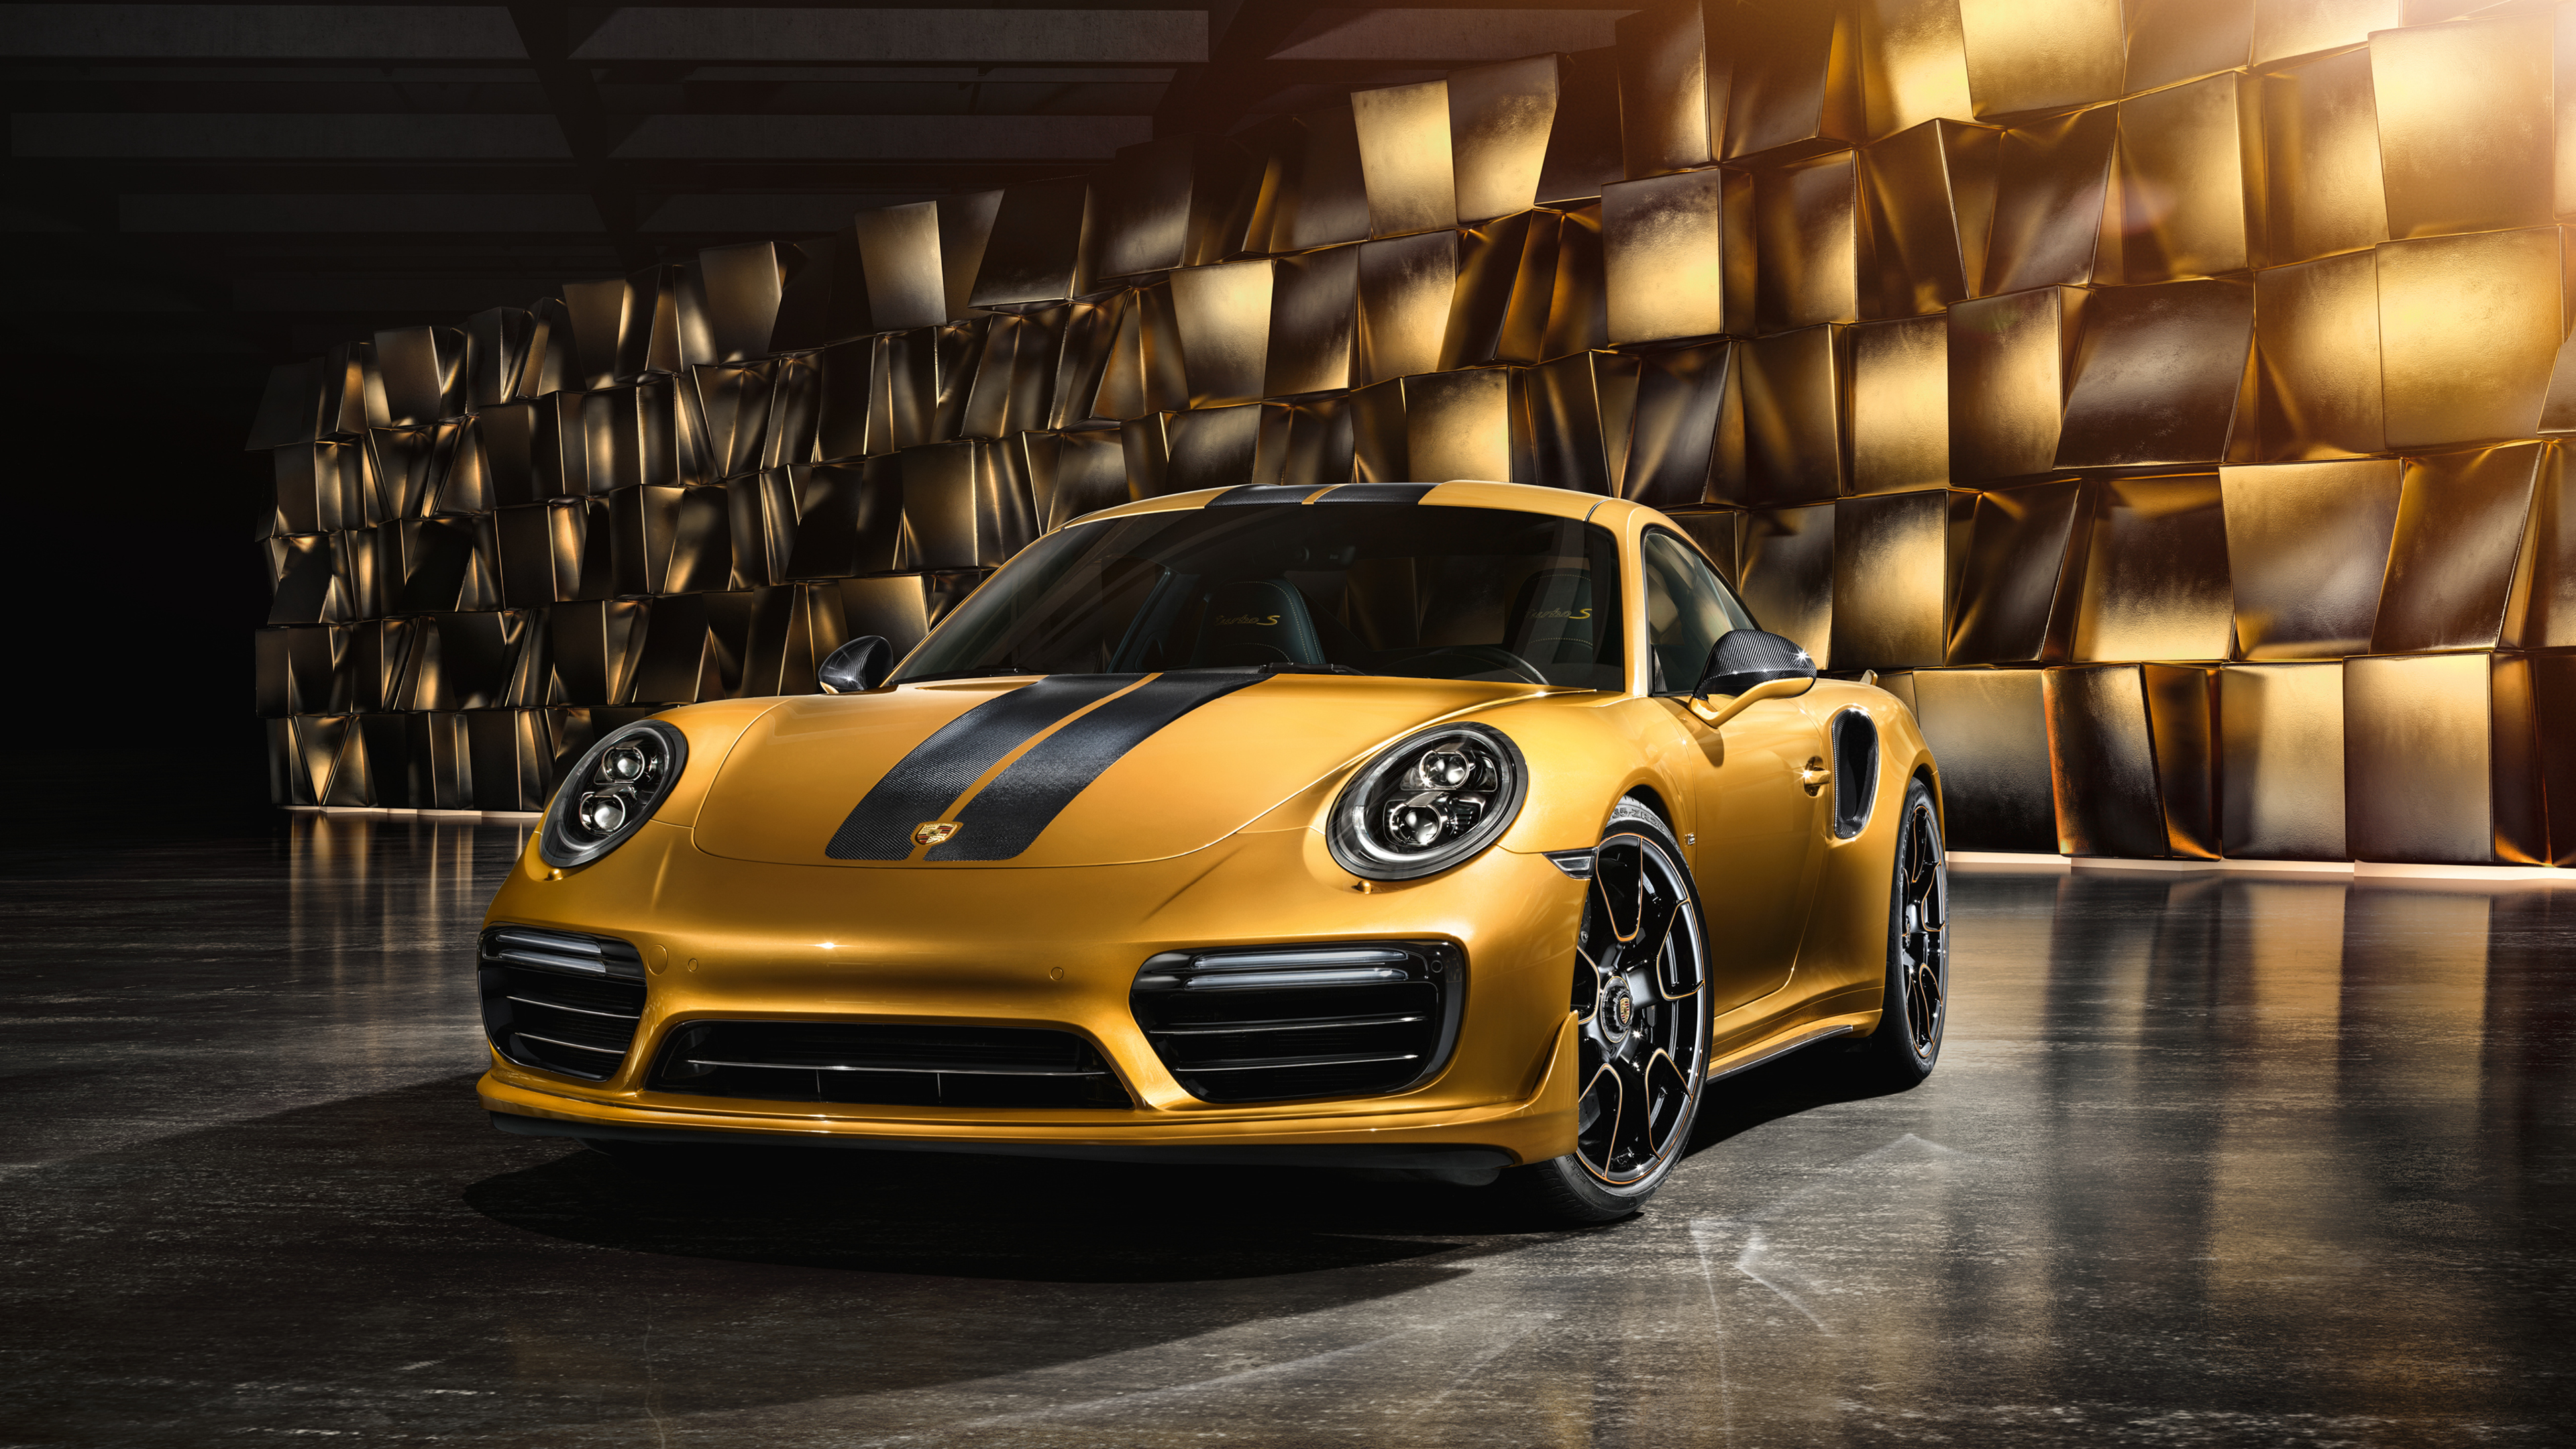 Wallpaper 4k Porsche 991 Ii Turbo R 4k Wallpapers Behance